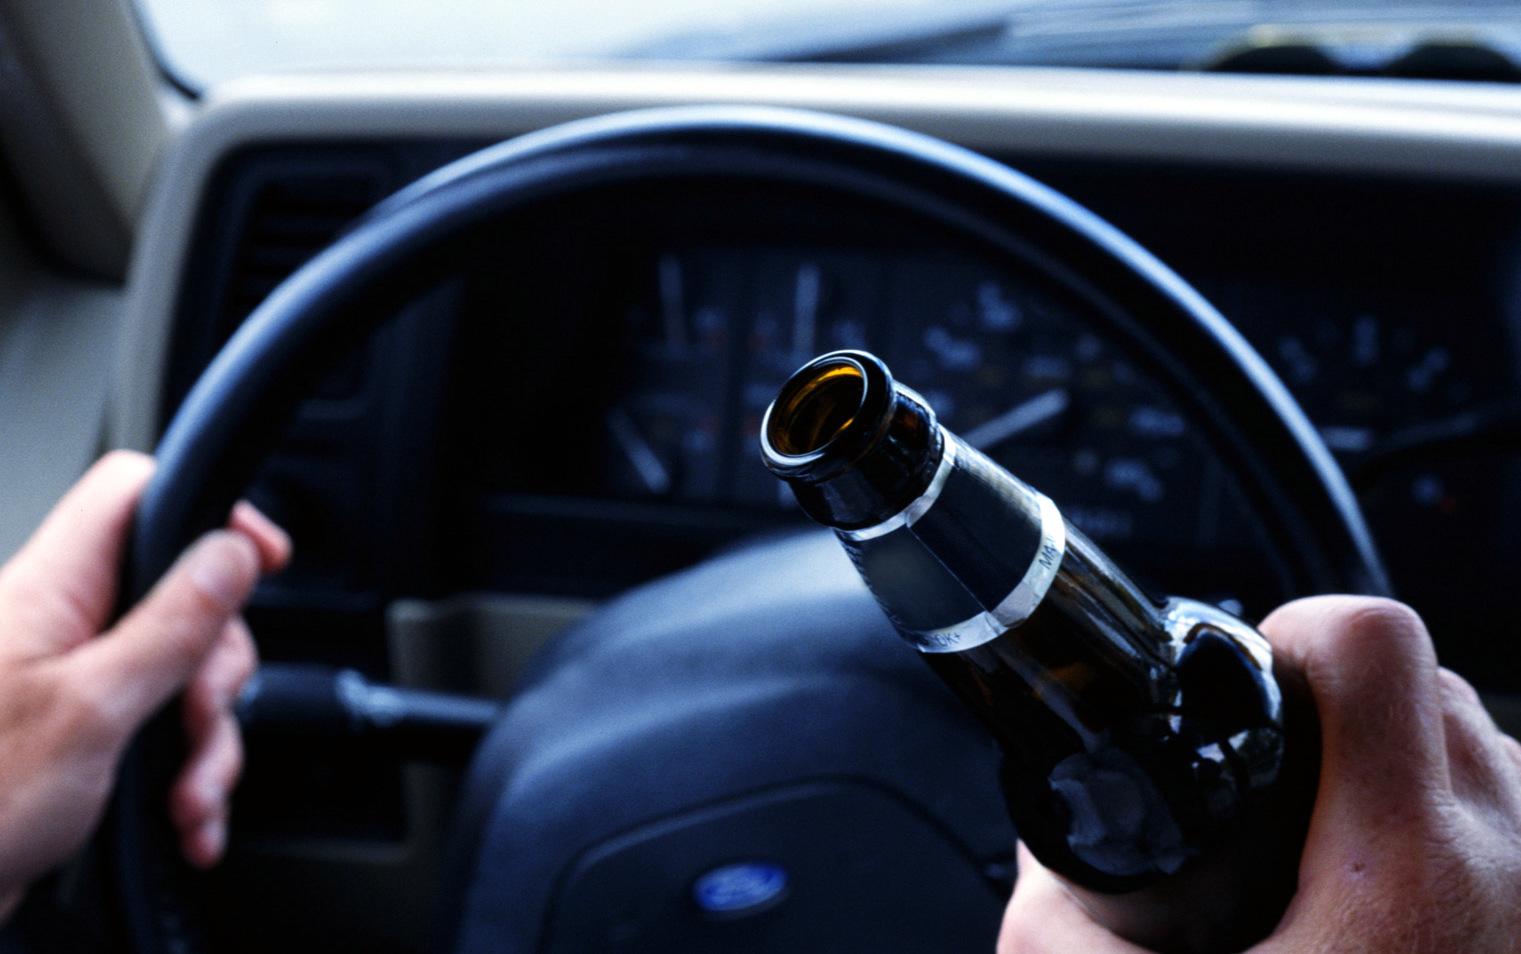 Брянских водителей проверят на трезвость